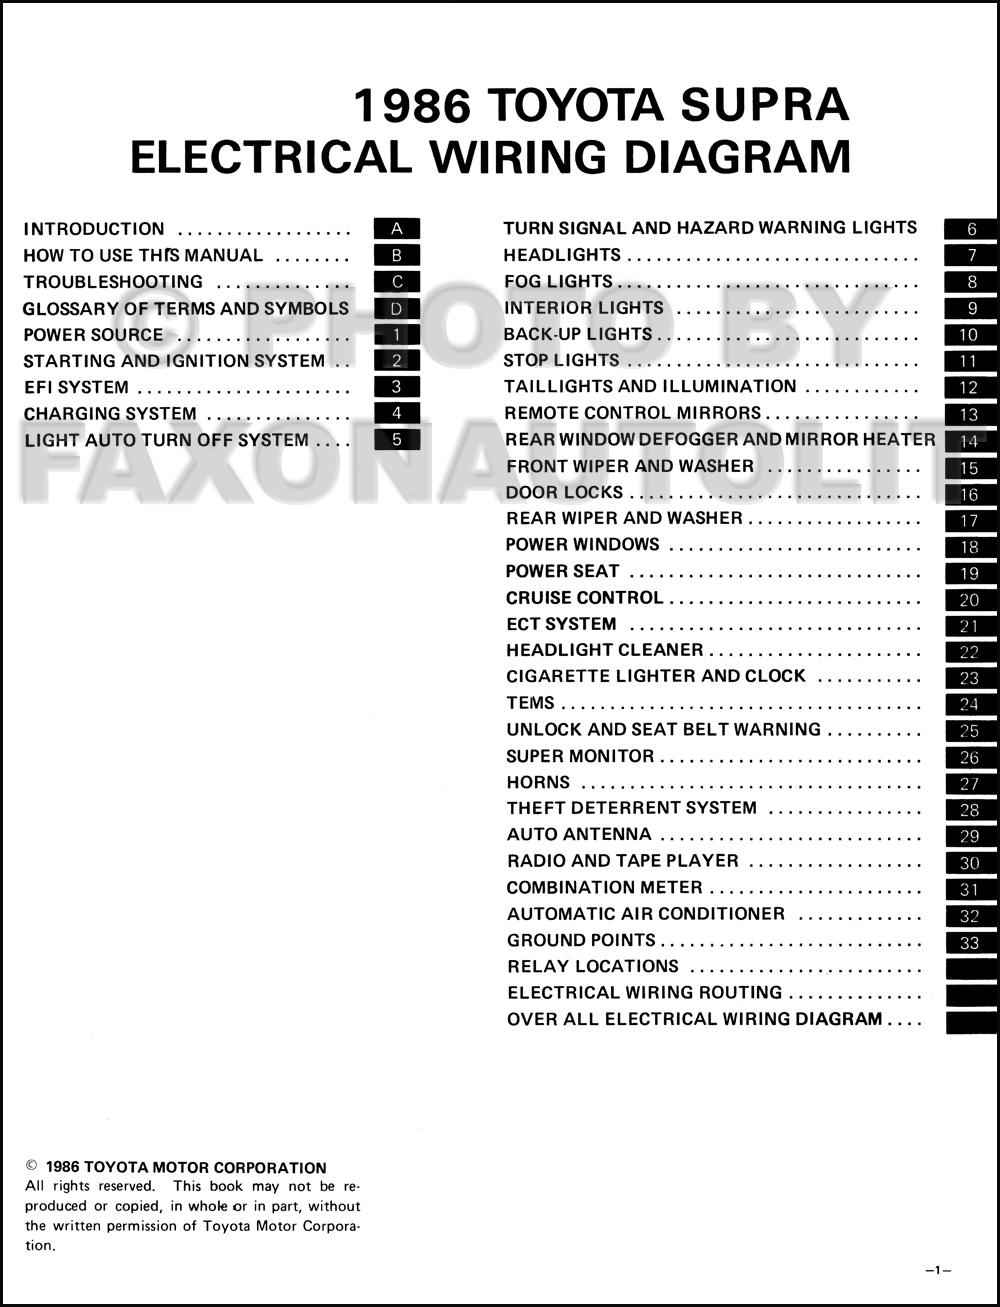 toyota supra wiring diagram toyota image wiring 1986 5 toyota supra wiring diagram manual original on toyota supra wiring diagram